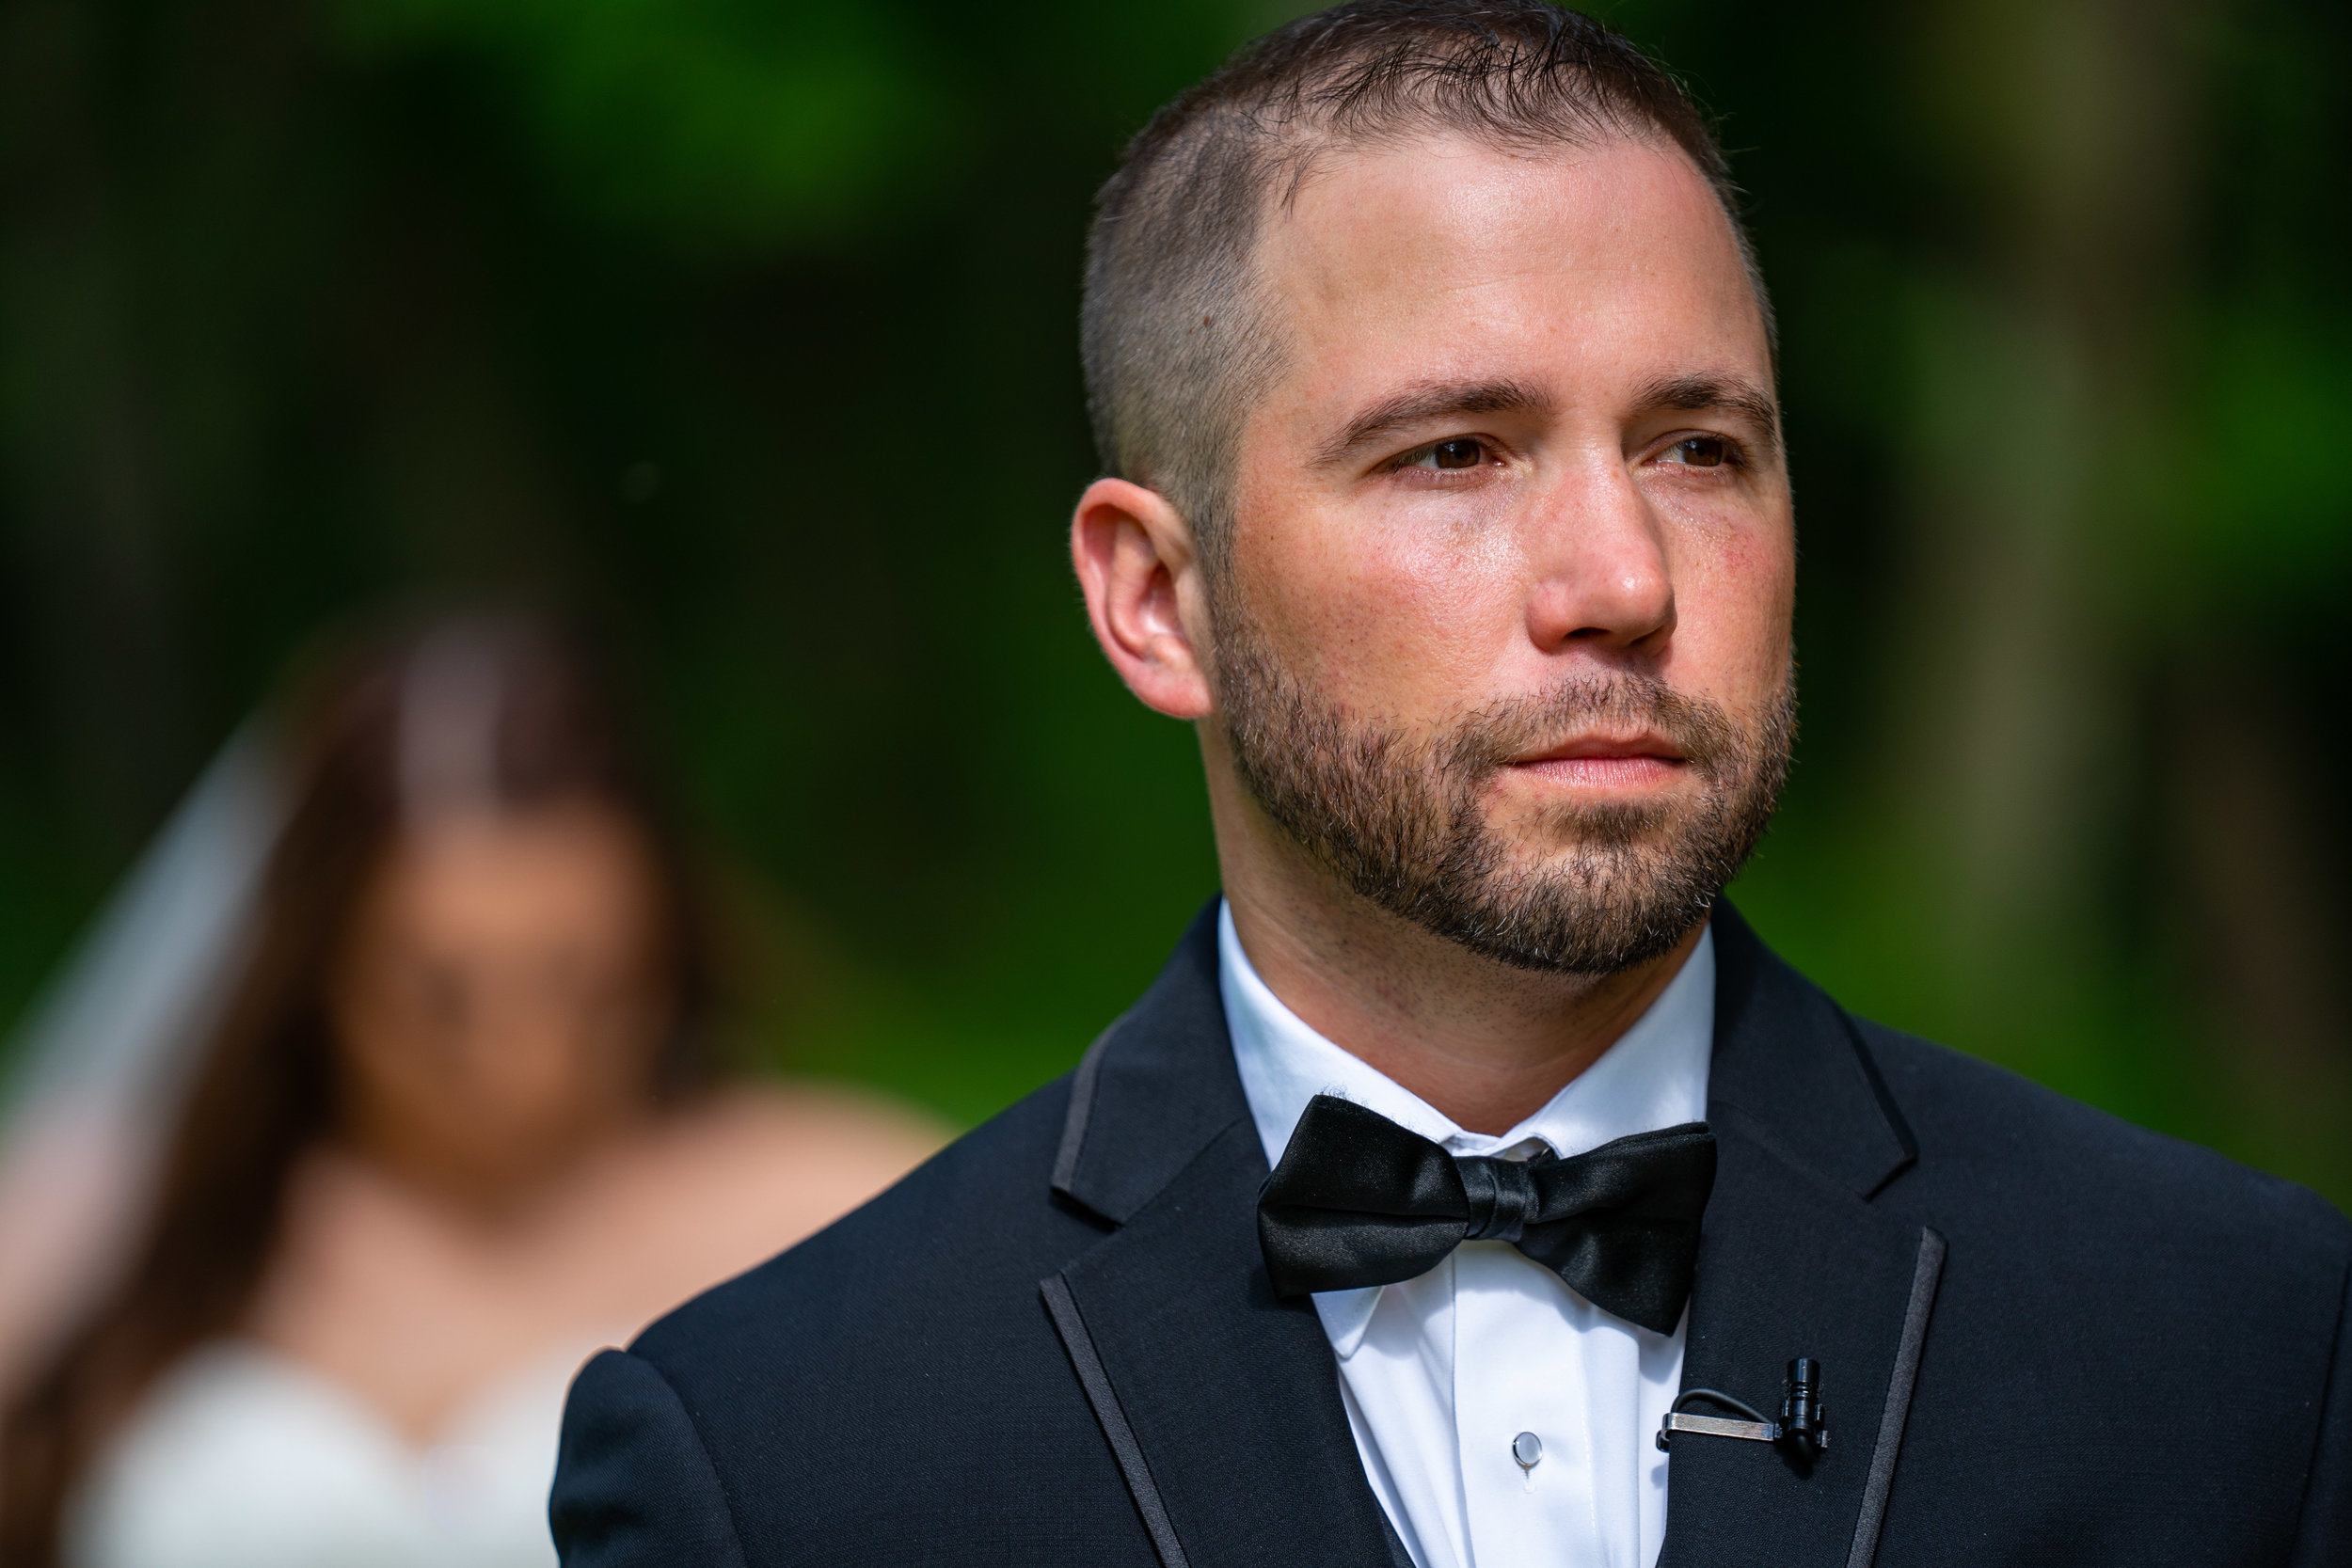 groom-bride-in-background-first-look-wedding-photography.jpg